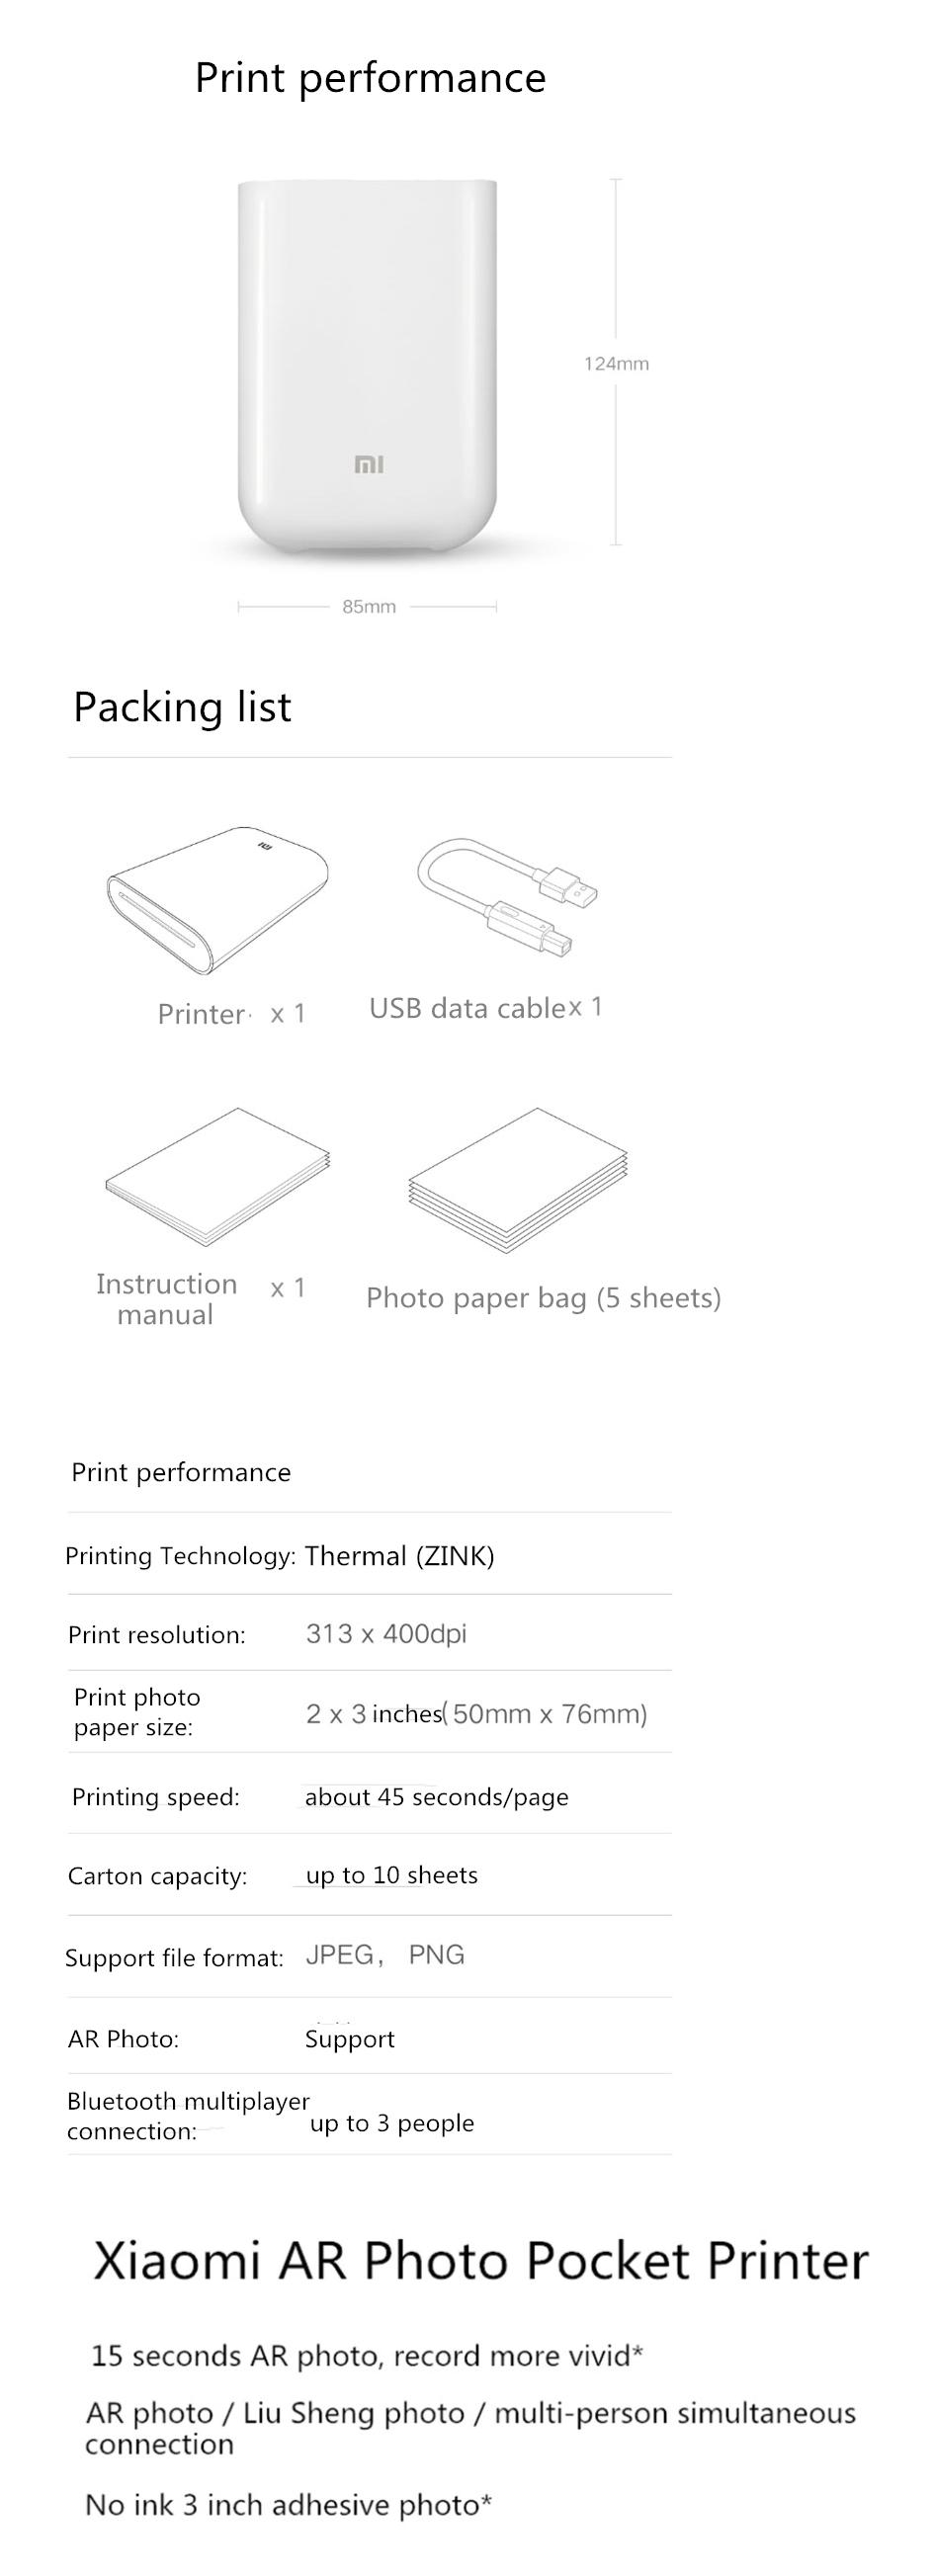 XIAOMI Pocket Photo Printer 3 Inch 300dpi AR ZINK Non-ink Mini Picture Printer bluetooth Connection 13